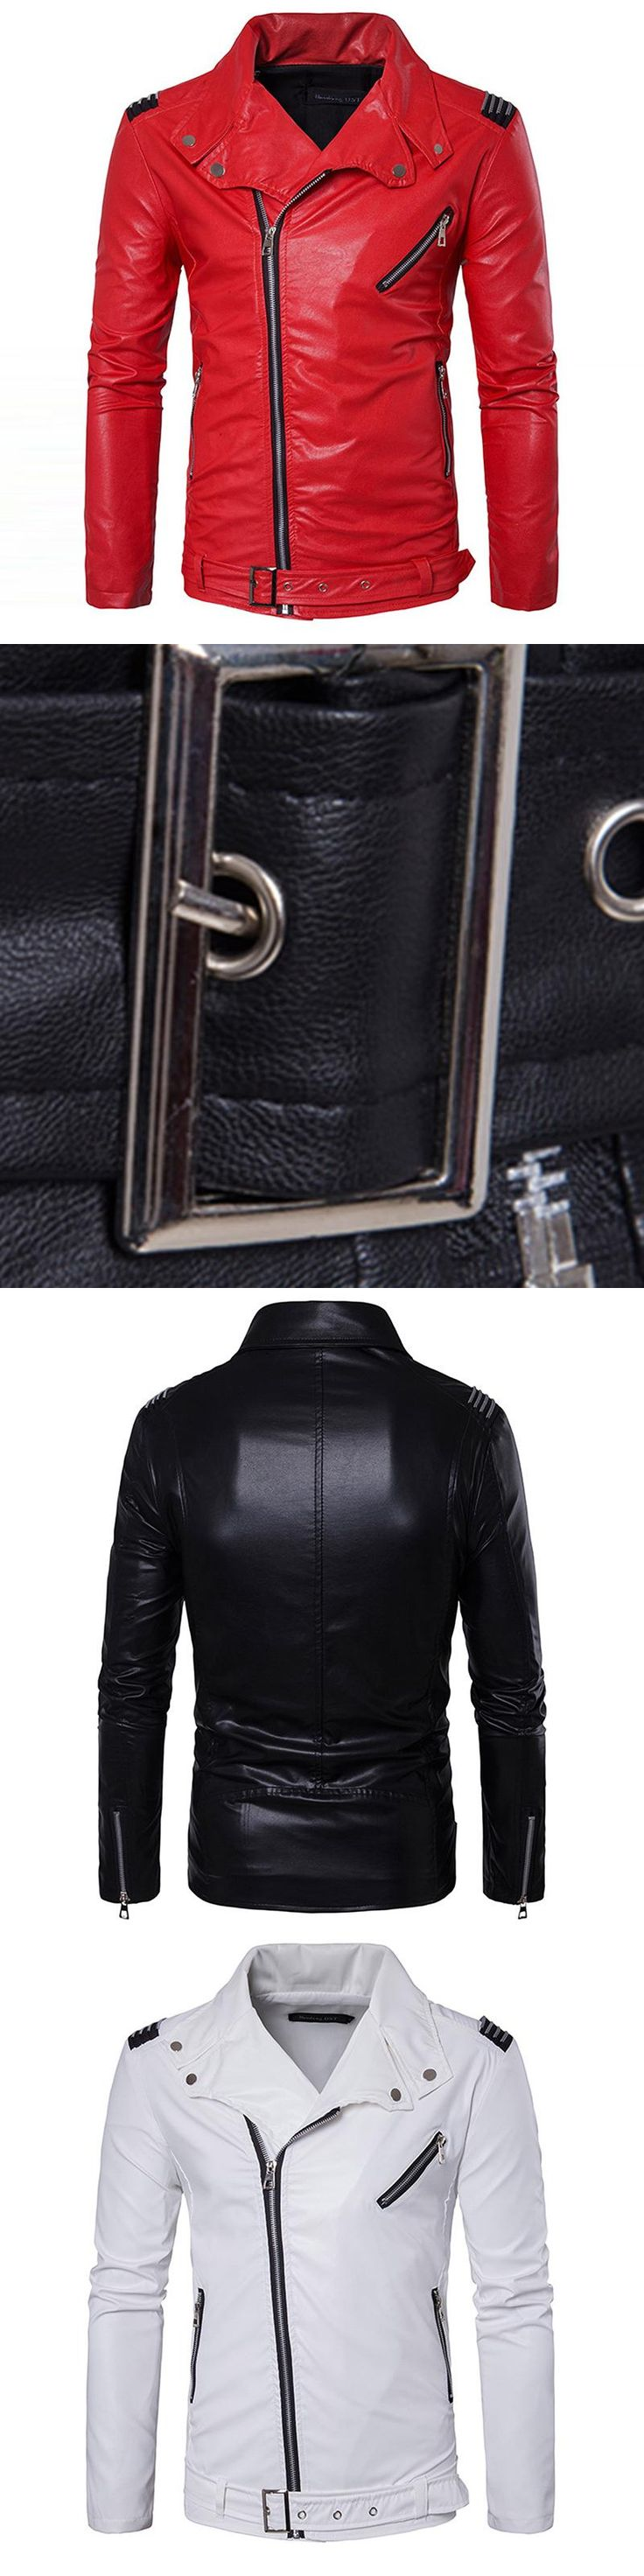 Manvelous Men Faux Leather Jacket Fashion Casual Long Sleeve Lapel Solid Thick Men Coat Black Red Color Slim Suede Men Clothing